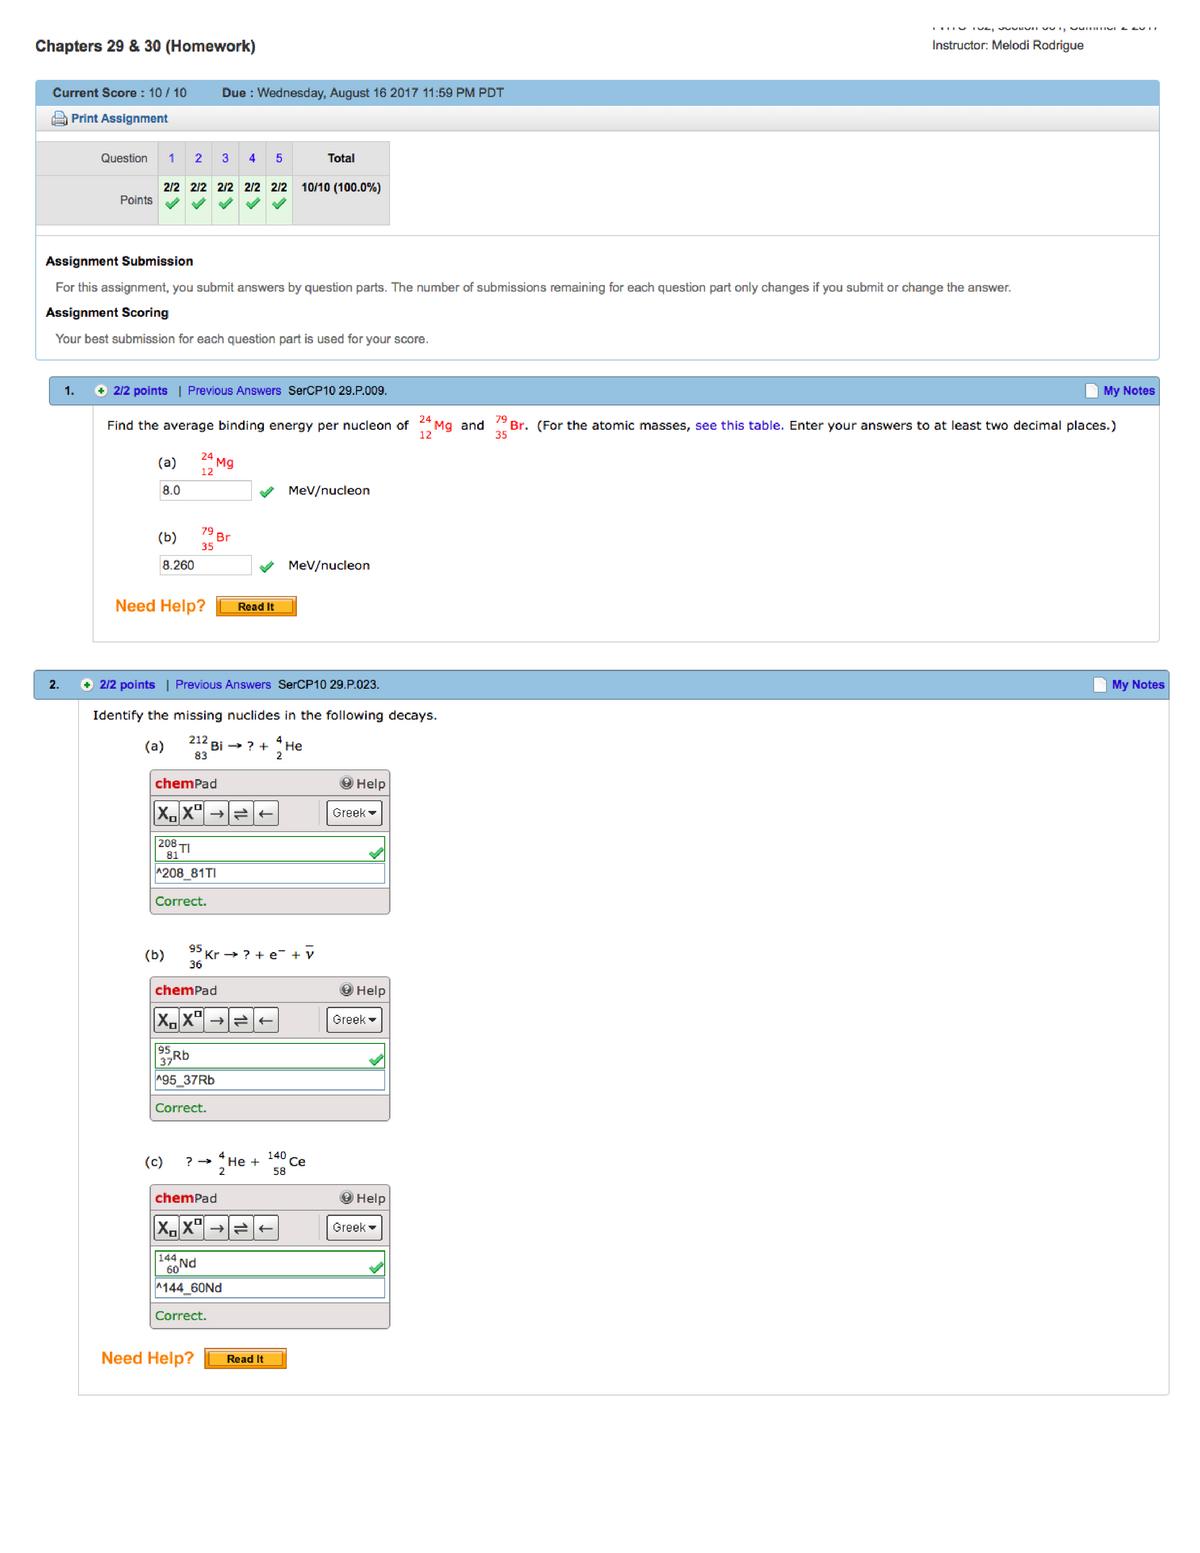 Webassignch 29 - WEBASSIGN CH 29 - PHYS 151A: General